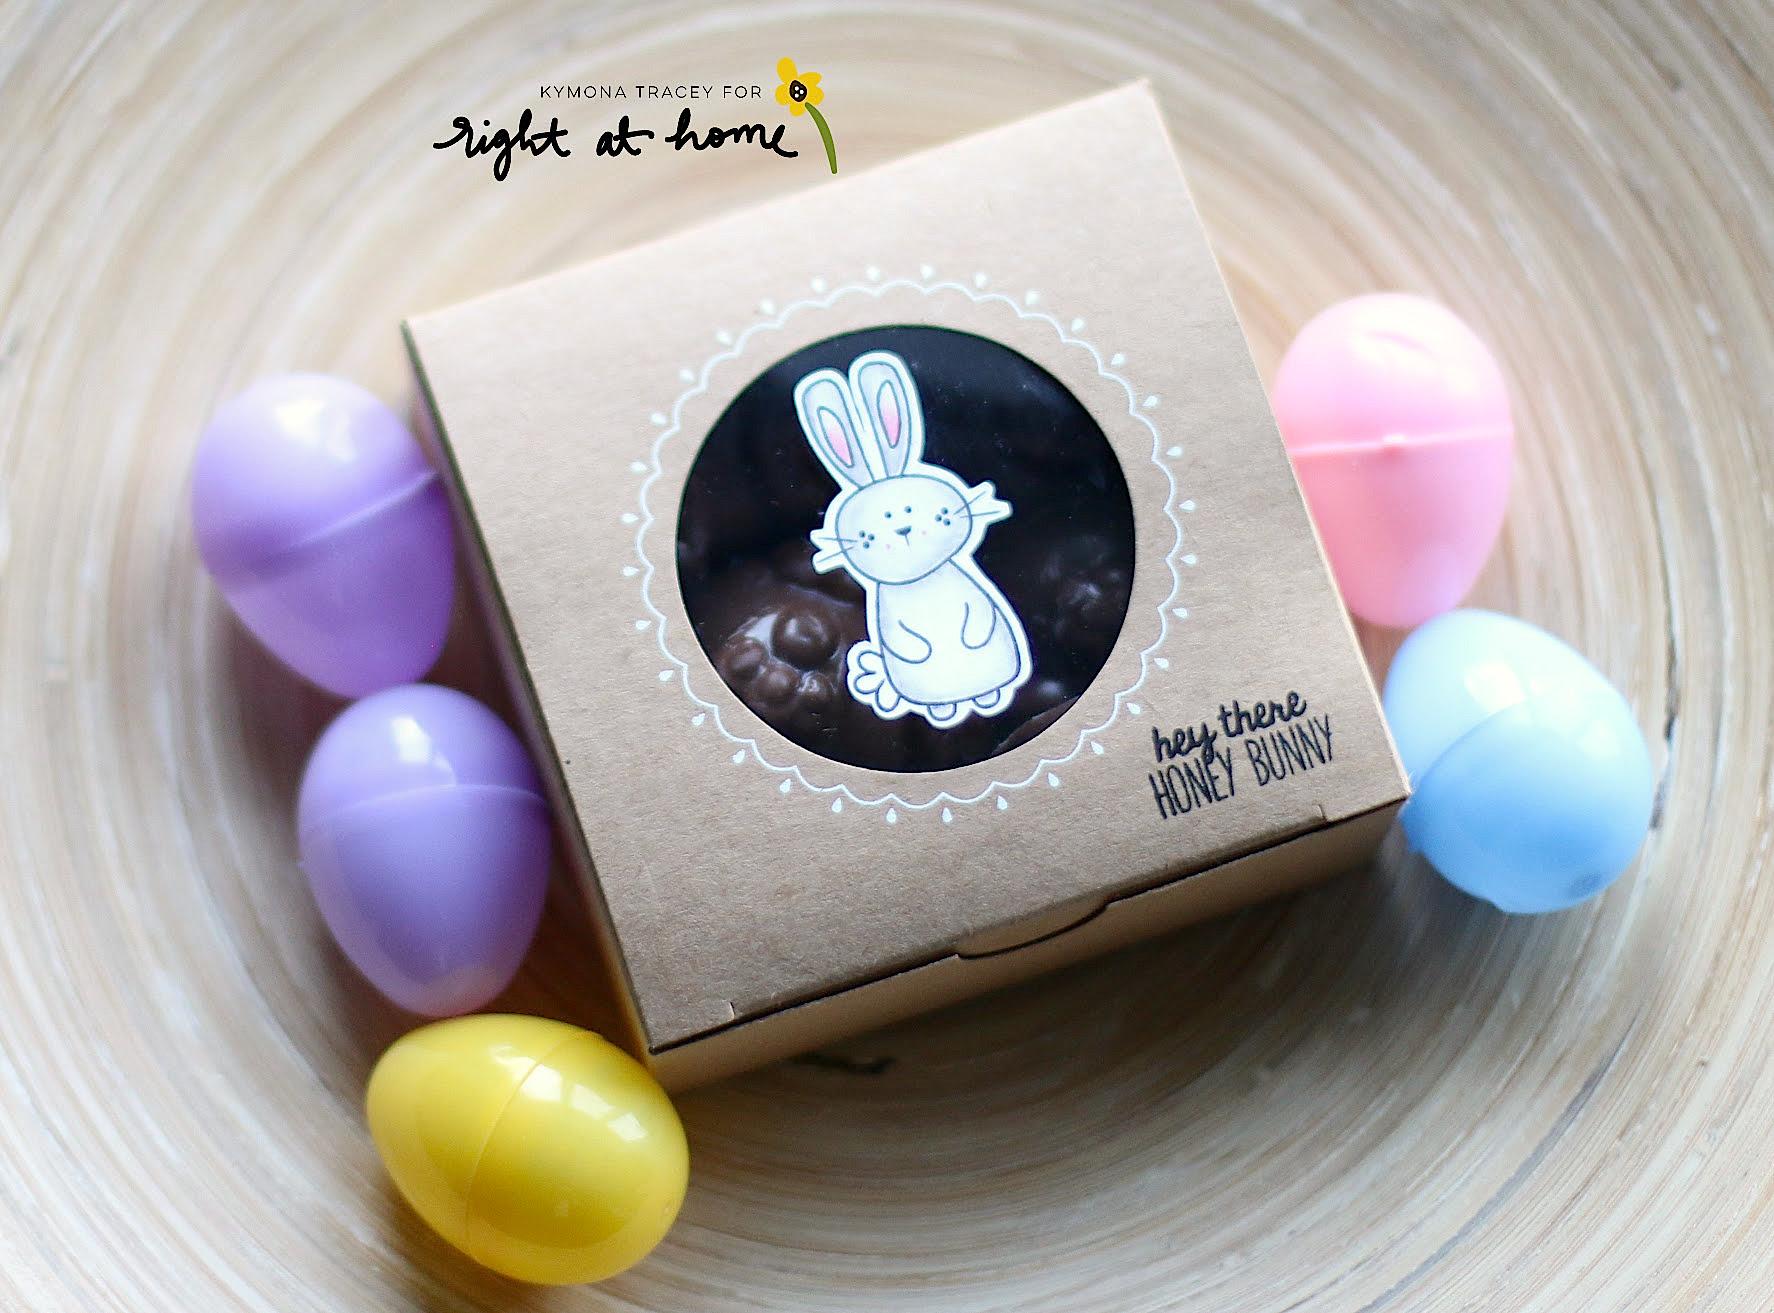 DIY Chocolate Bunny Gift Boxes by Kymona // Homemade with Love Day #2 - rightathomeshop.com/blog